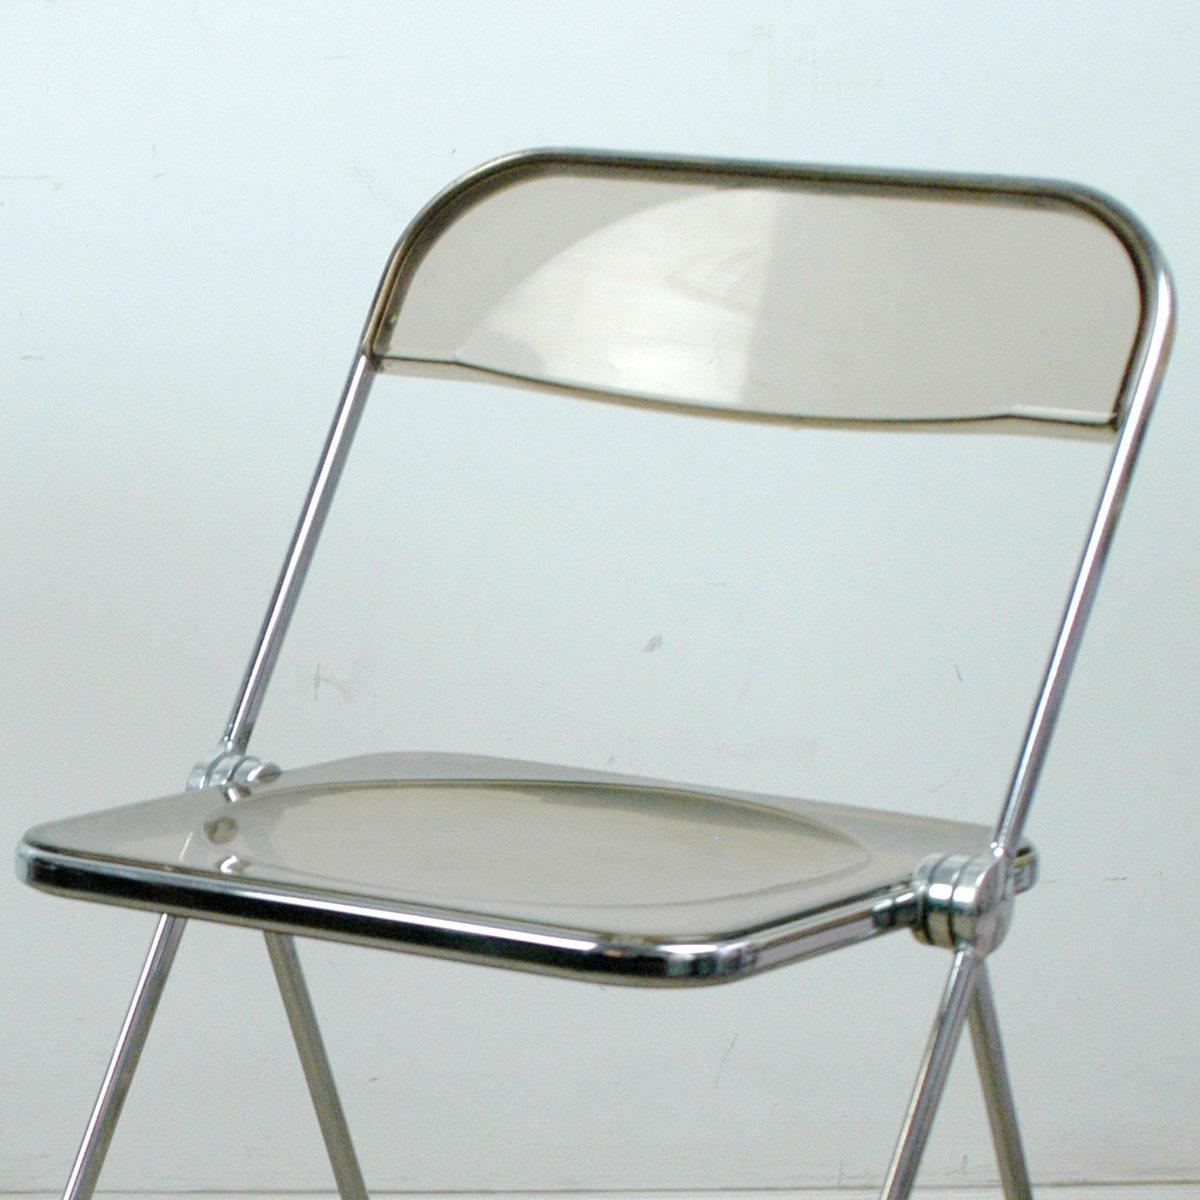 folding chairs plia folding chair by giancarlo piretti for castelli 1970s chairs